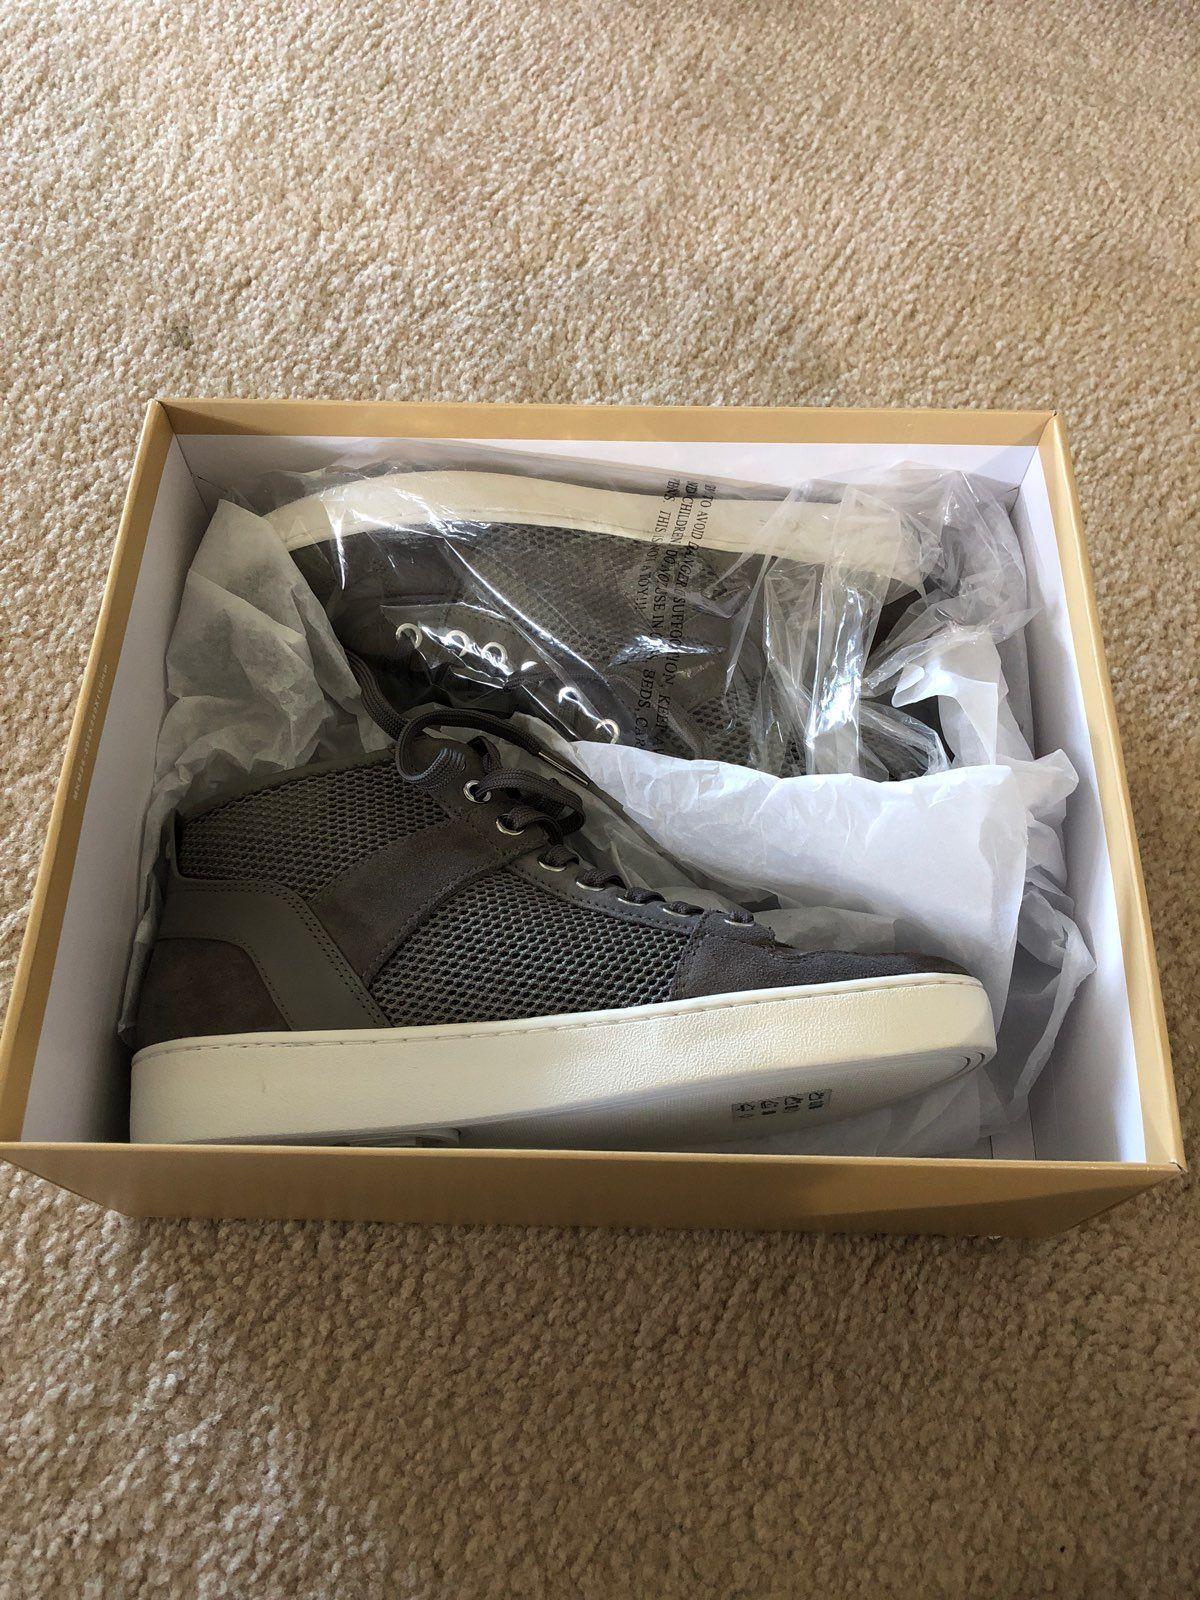 Michael Kors Matty High Top Sneakers